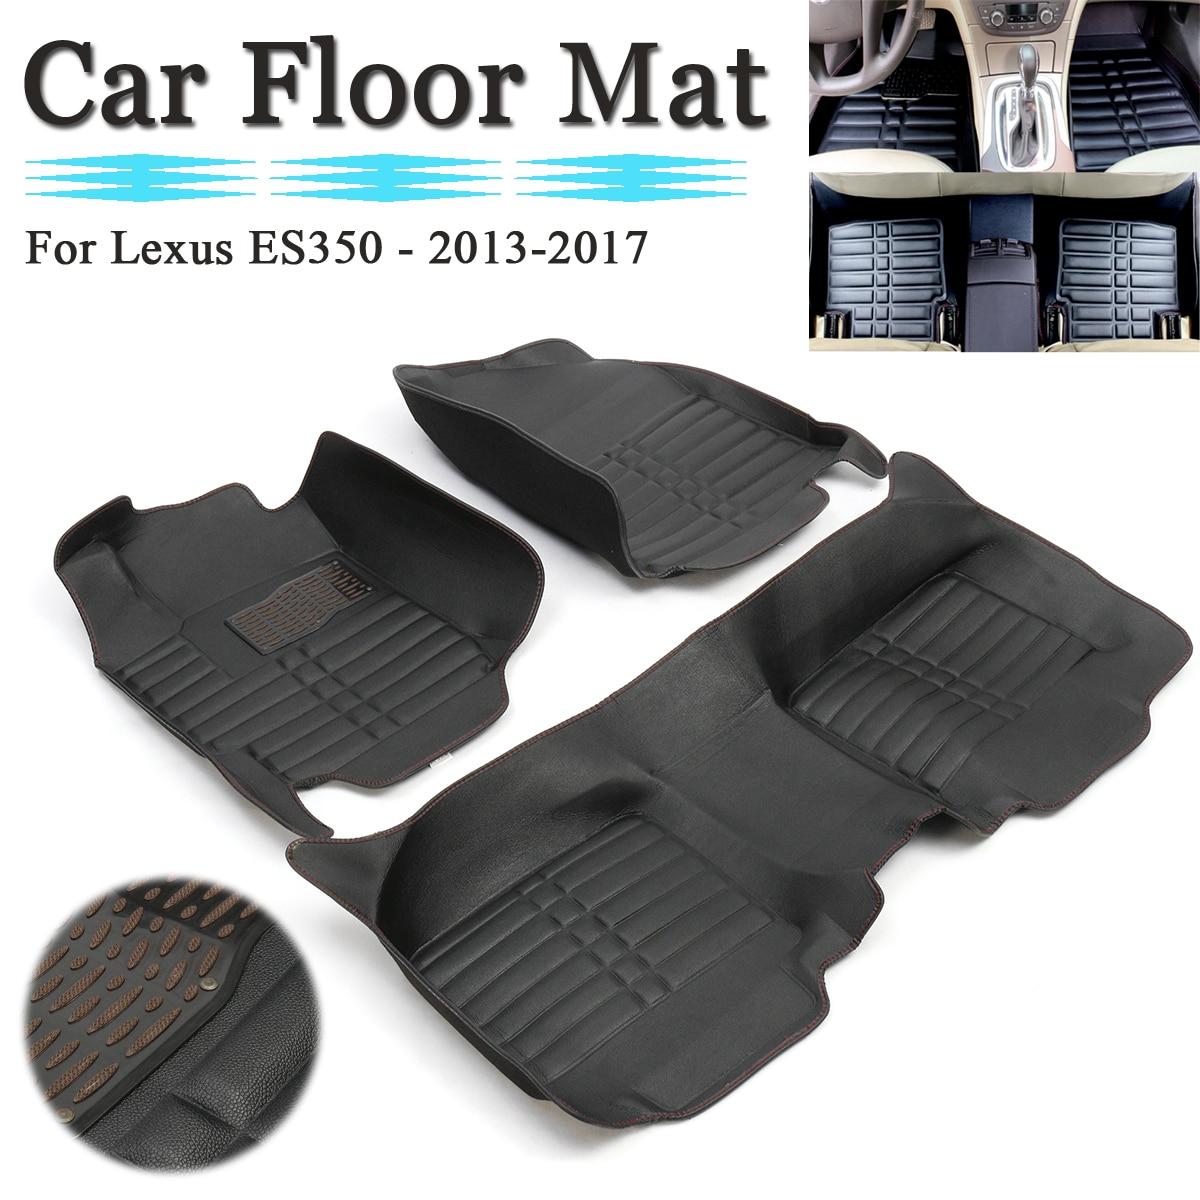 2013 Lexus Es Interior: 3Pcs Black Leather Waterproof Car Floor Mats Carpet Liner